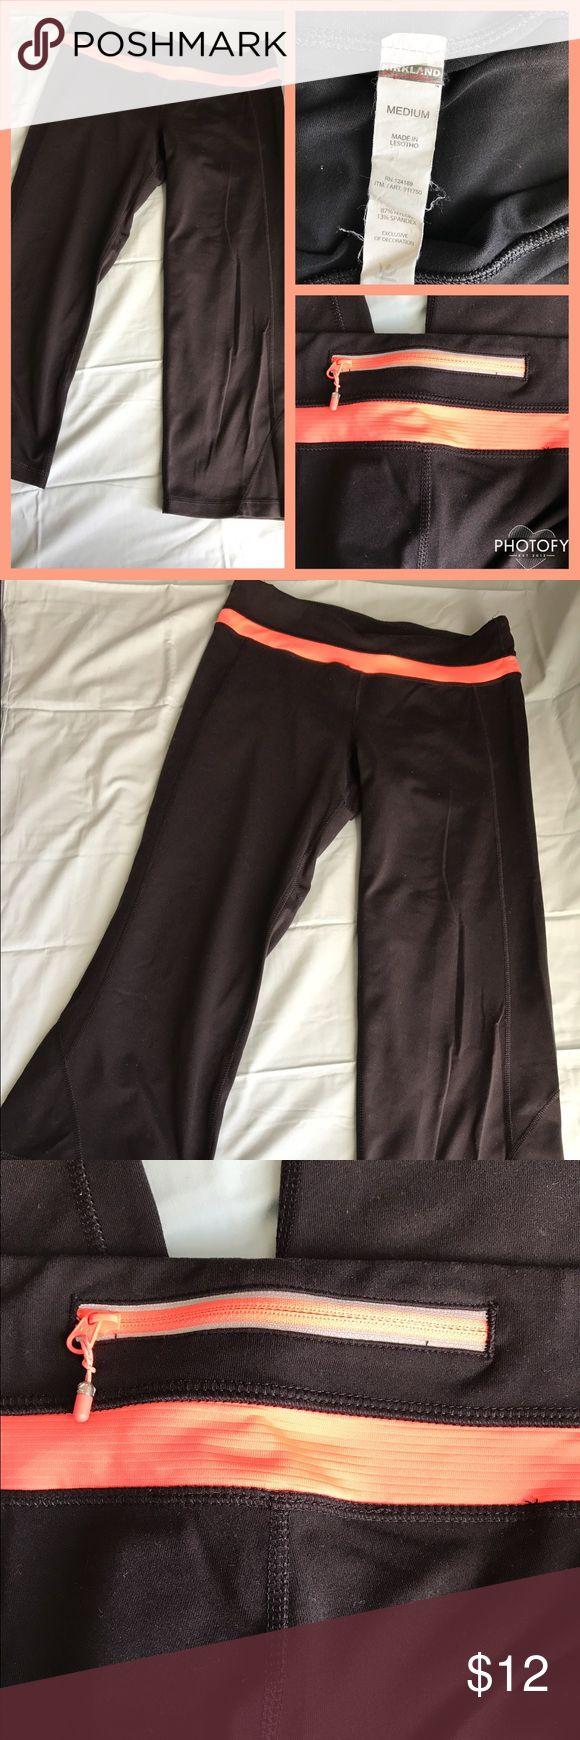 🔶Kirkland(Costco) Capris Black/Orange Size M🔶 🔶Kirkland(Costco) Capris Black/Orange🔶 🔶Size M🔶 🔶Fabric: 87% Nylon 13% Spandex 🔶 🔶worn a couple times🔶 🔶Zipper in back to hold personal items like keys🔶  🔶NO damage, snags, stains🔶 Kirkland Pants Capris